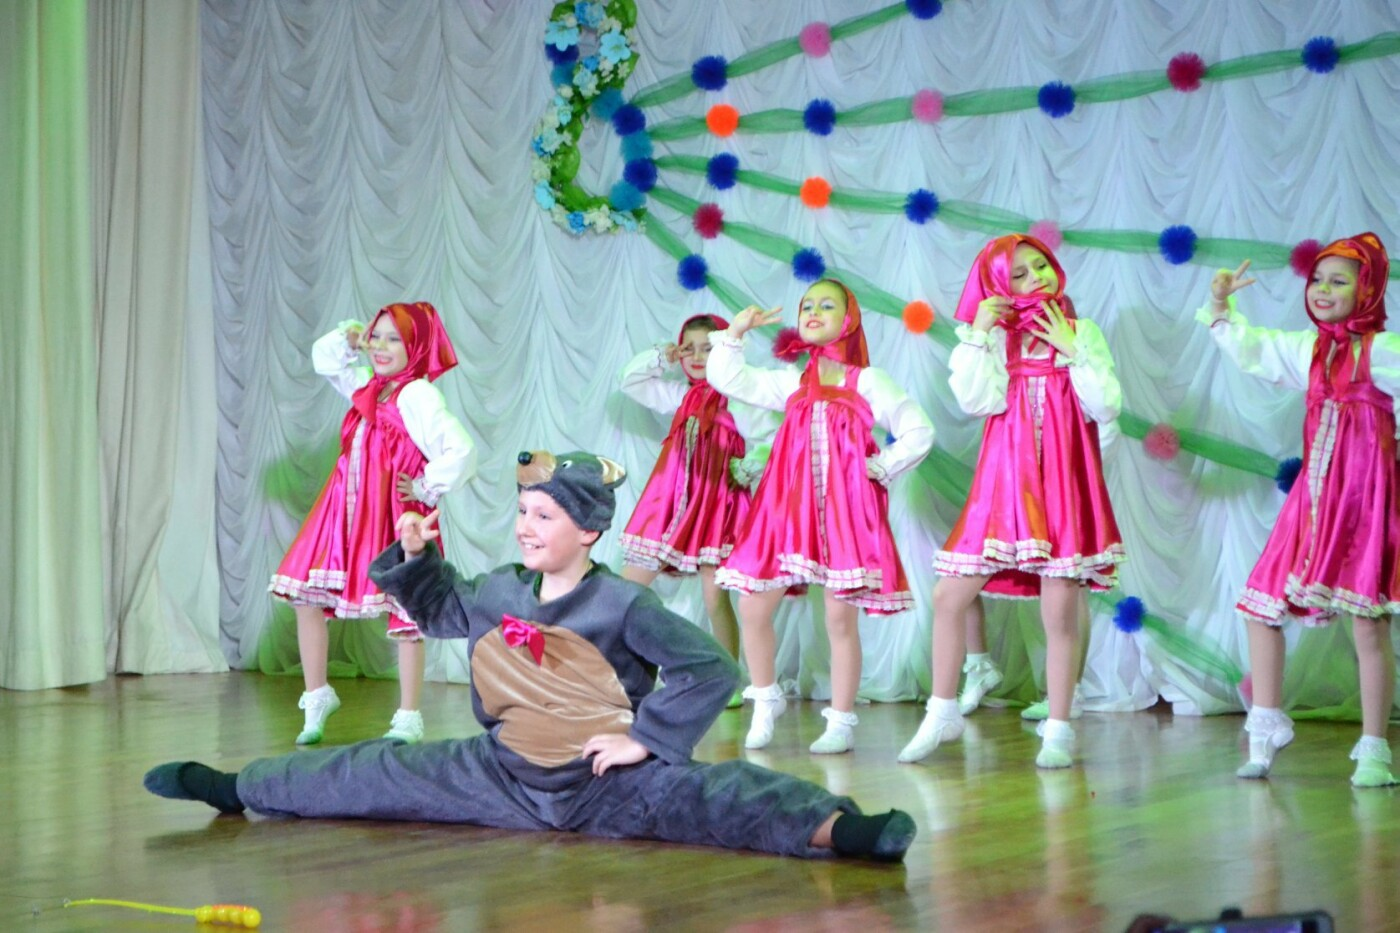 В селе Малодолинское поздравили женщин с 8 Марта, фото-5